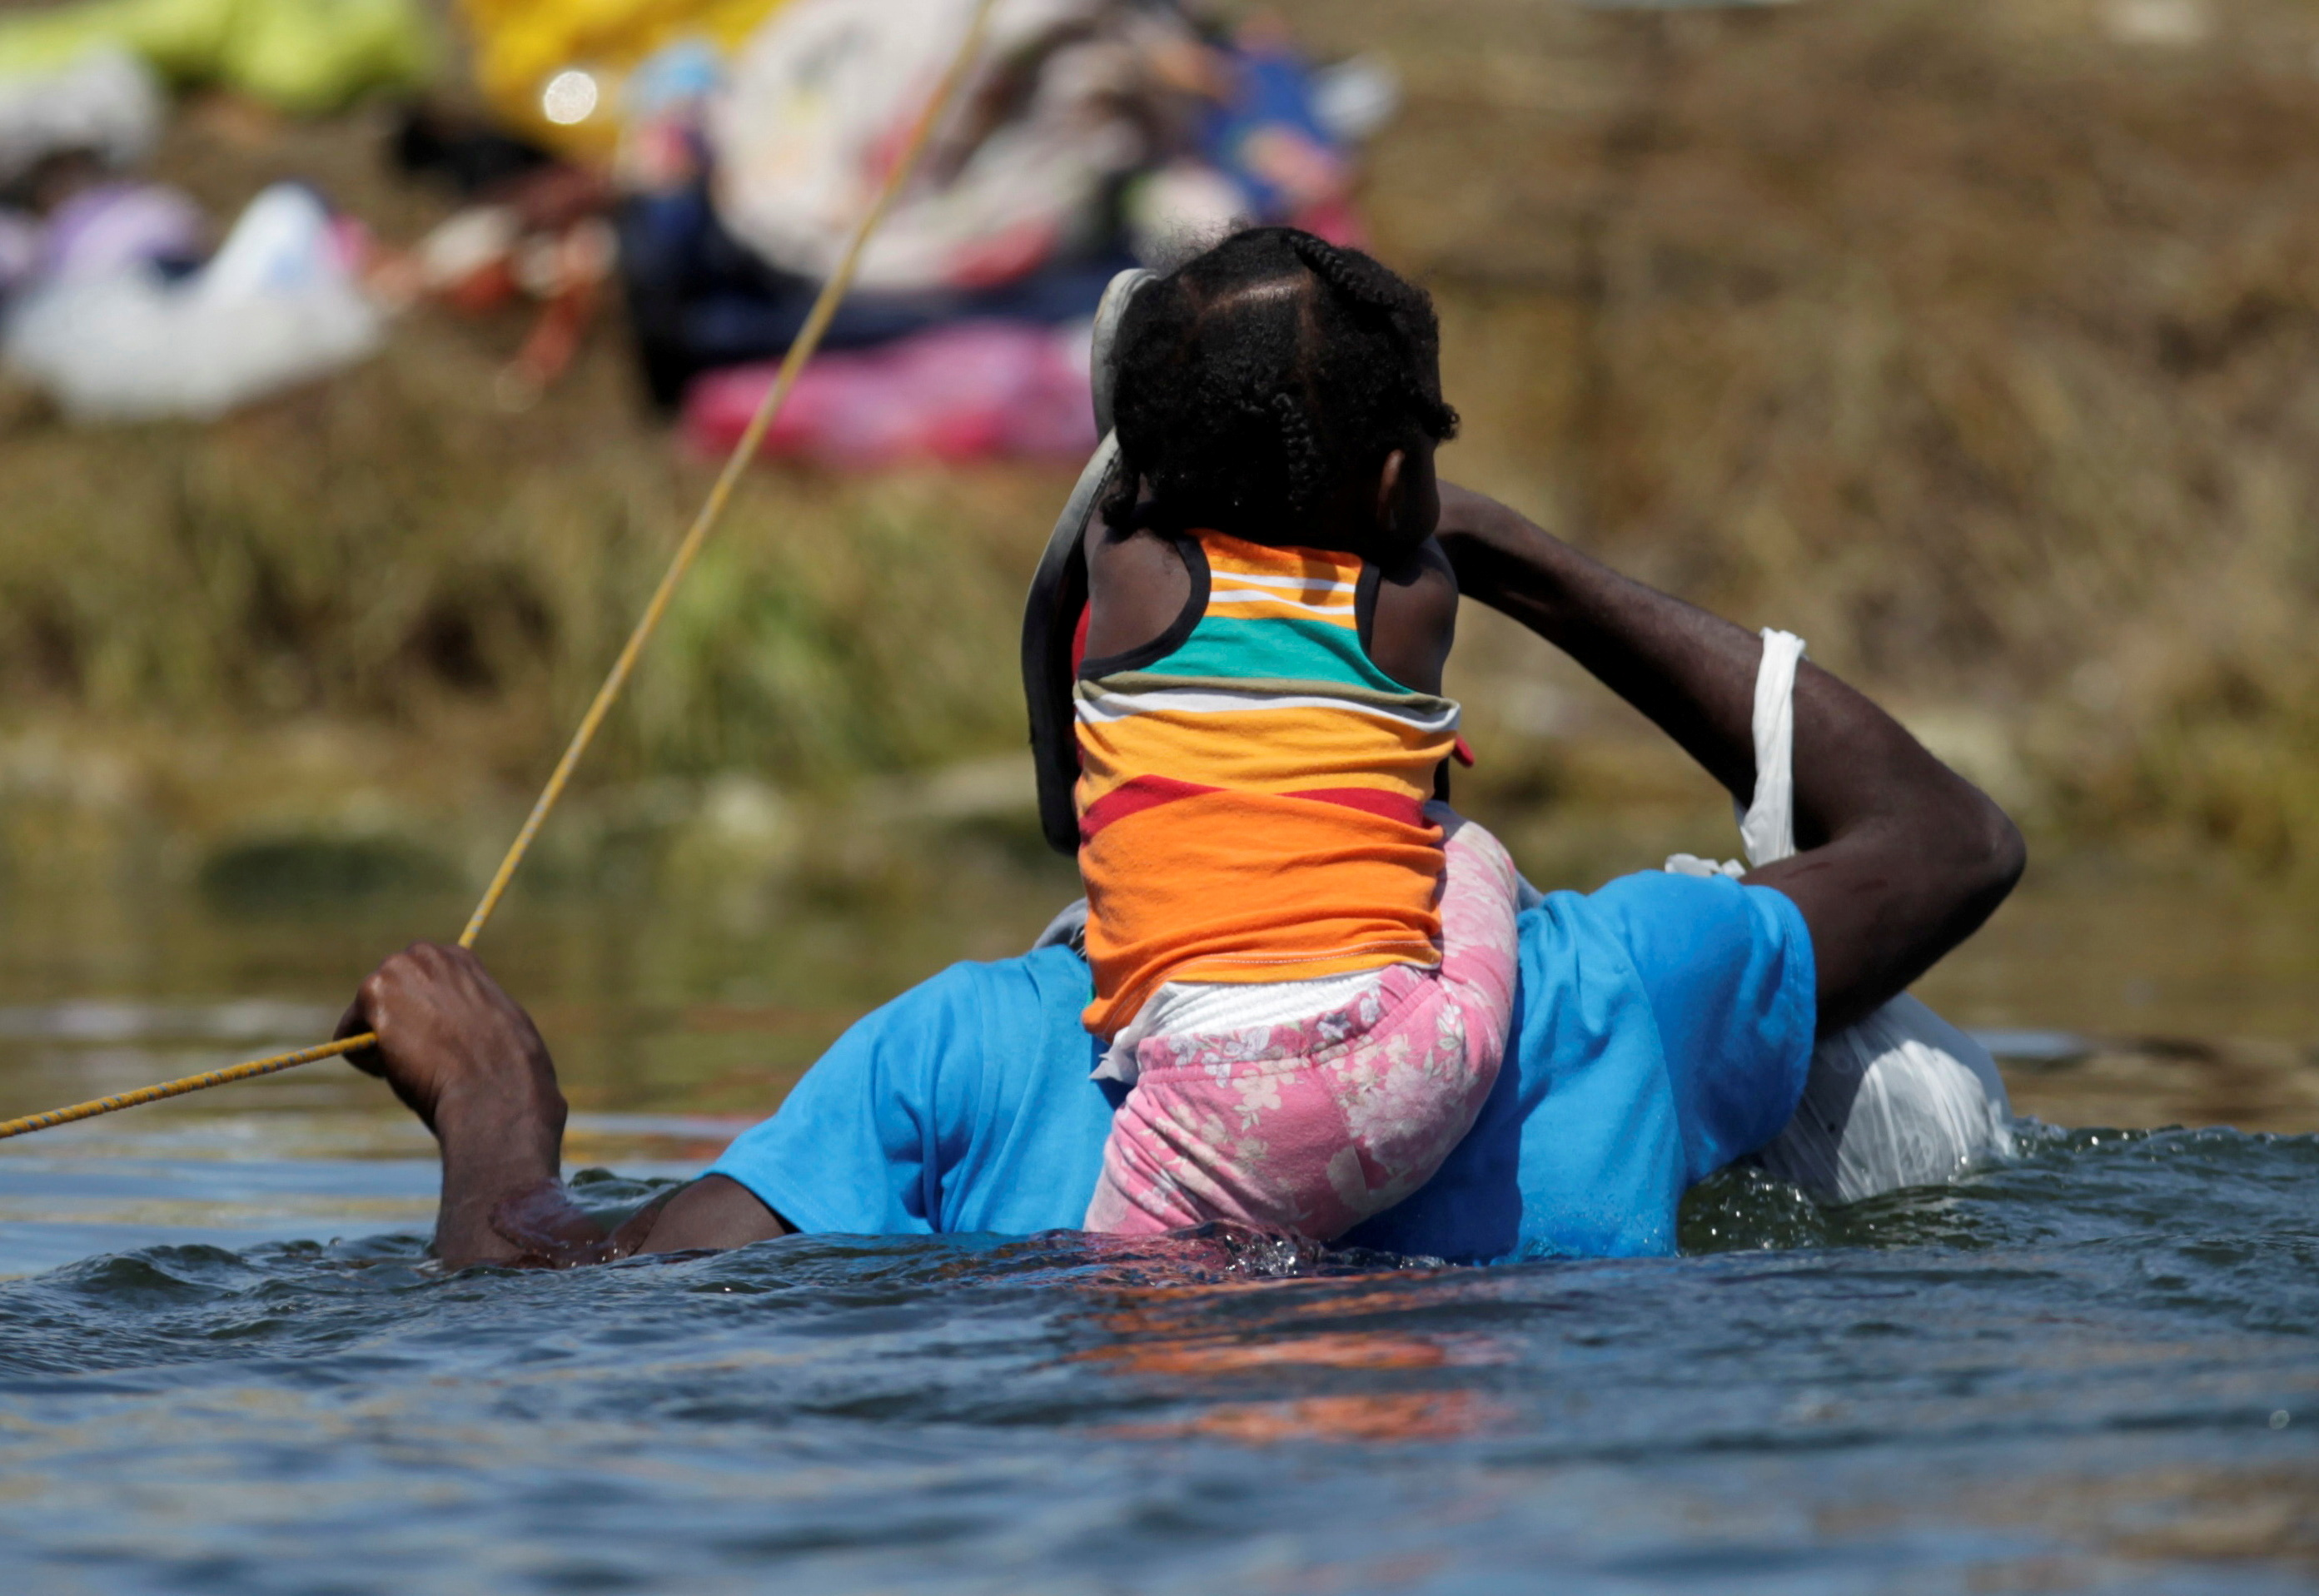 A migrant with a child seeking refuge in the U.S. wades through the Rio Grande from Ciudad Acuna, Mexico toward Del Rio, Texas, U.S., in Ciudad Acuna, Mexico September 22, 2021. REUTERS/Daniel Becerril